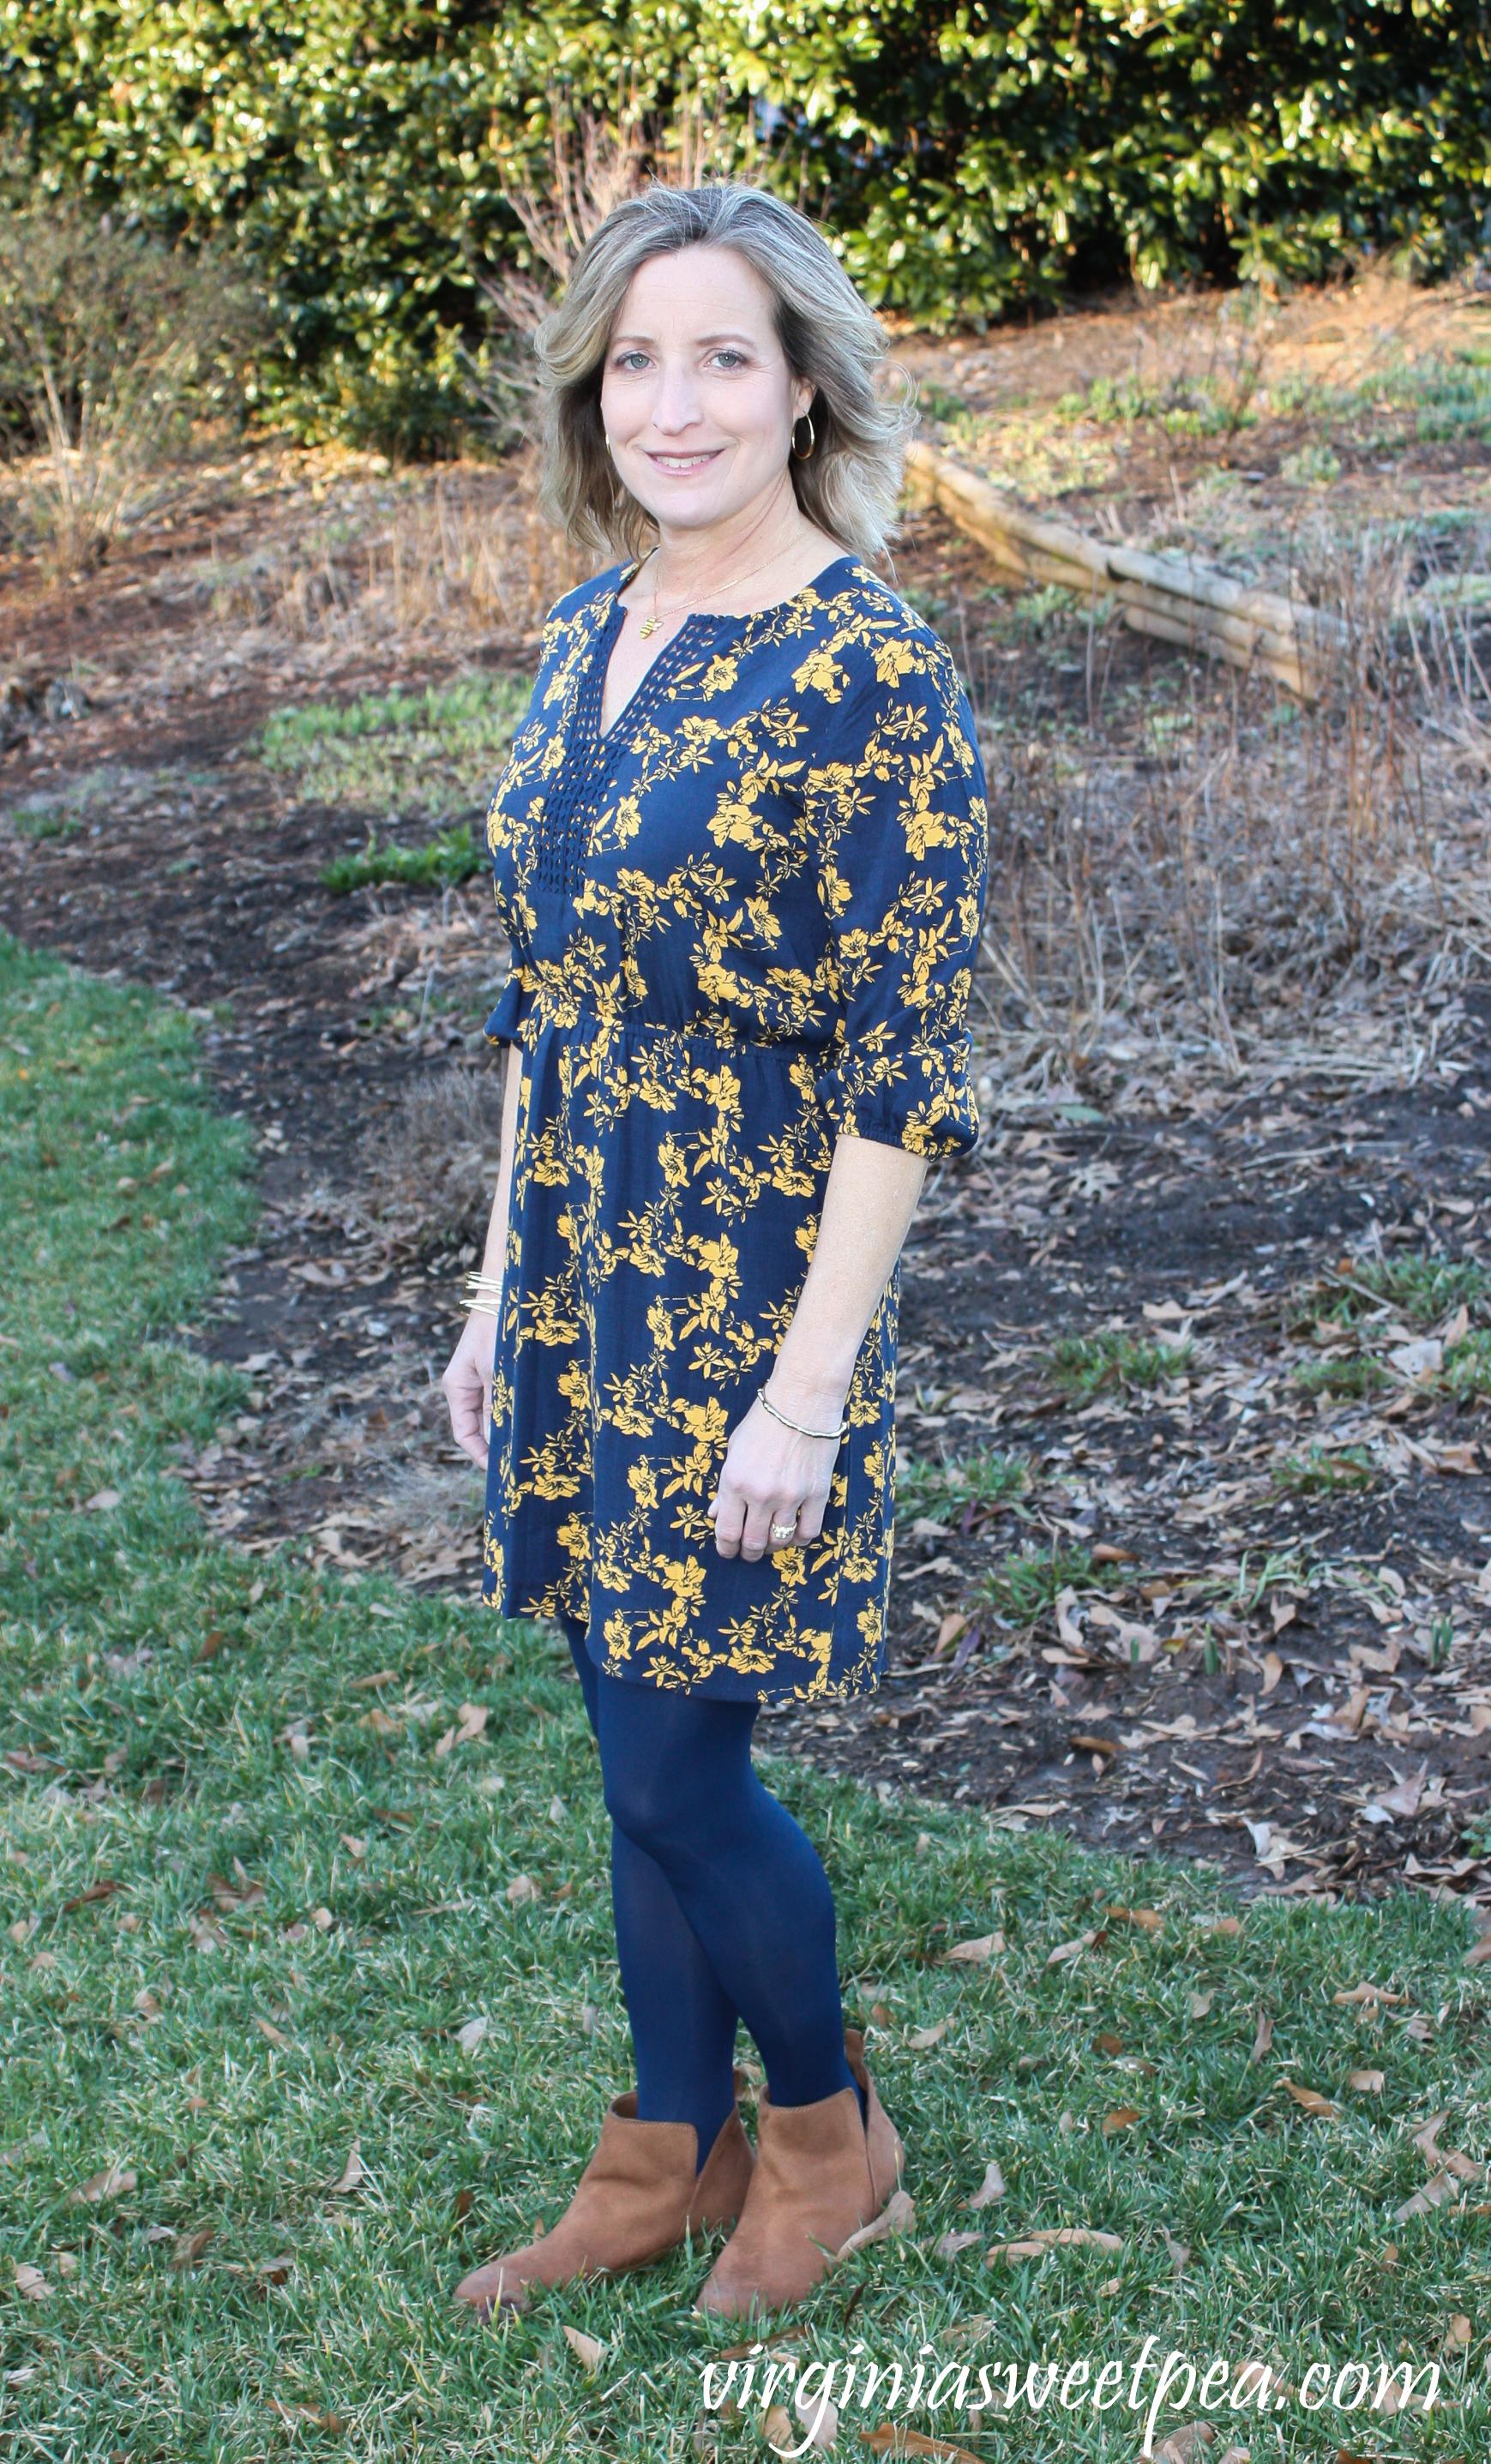 Stitch Fix Review for March 2019 - Market & Spruce Prim Crochet Trim Dress #stitchfix #stitchfixreview #stitchfix2019 #stitchfixspring #stitchfixdress